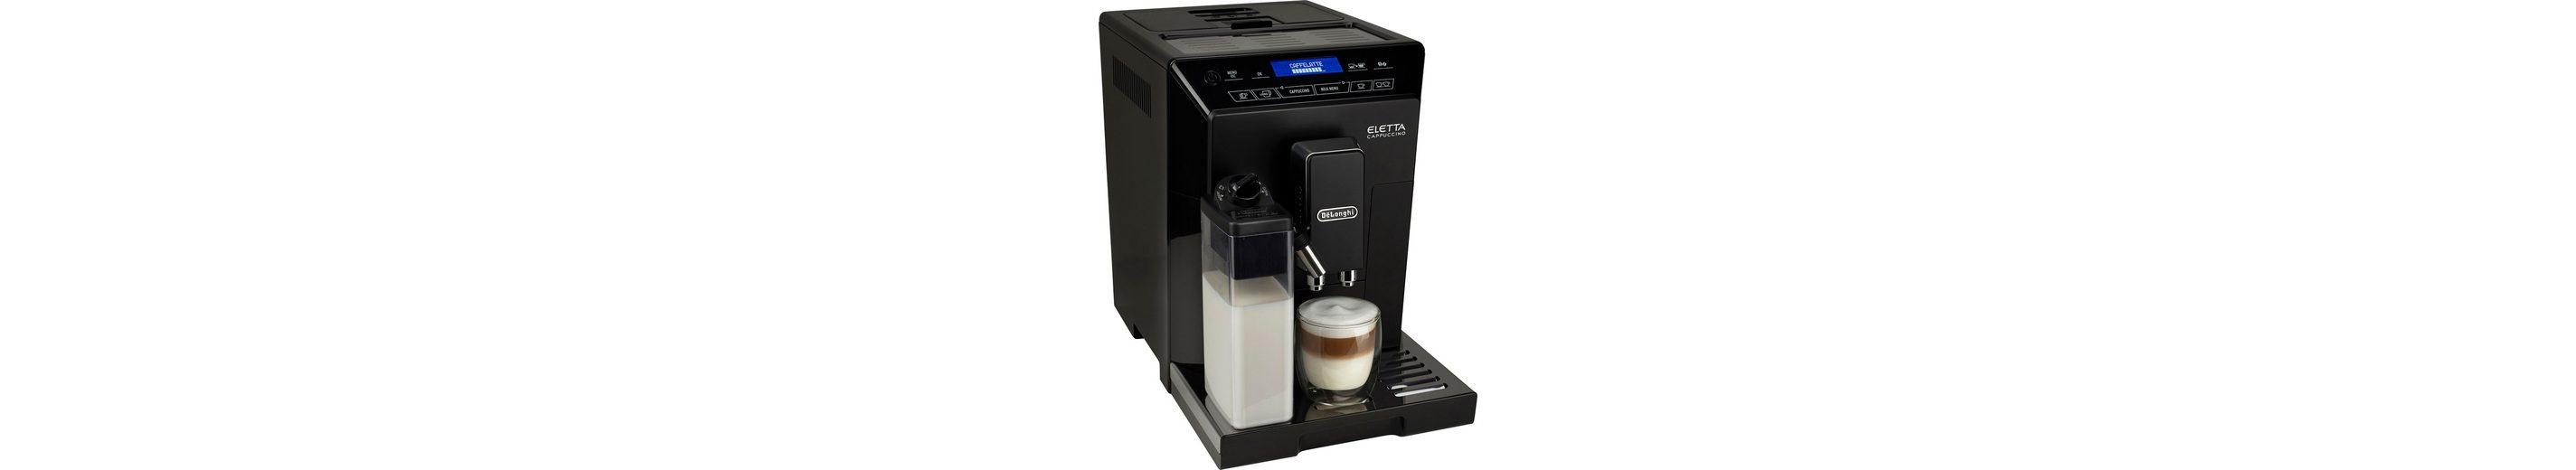 De'Longhi Kaffeevollautomat »ECAM 44.666.B«, Milchbehälter, Hochglanz-Schwarz / Edelstahl